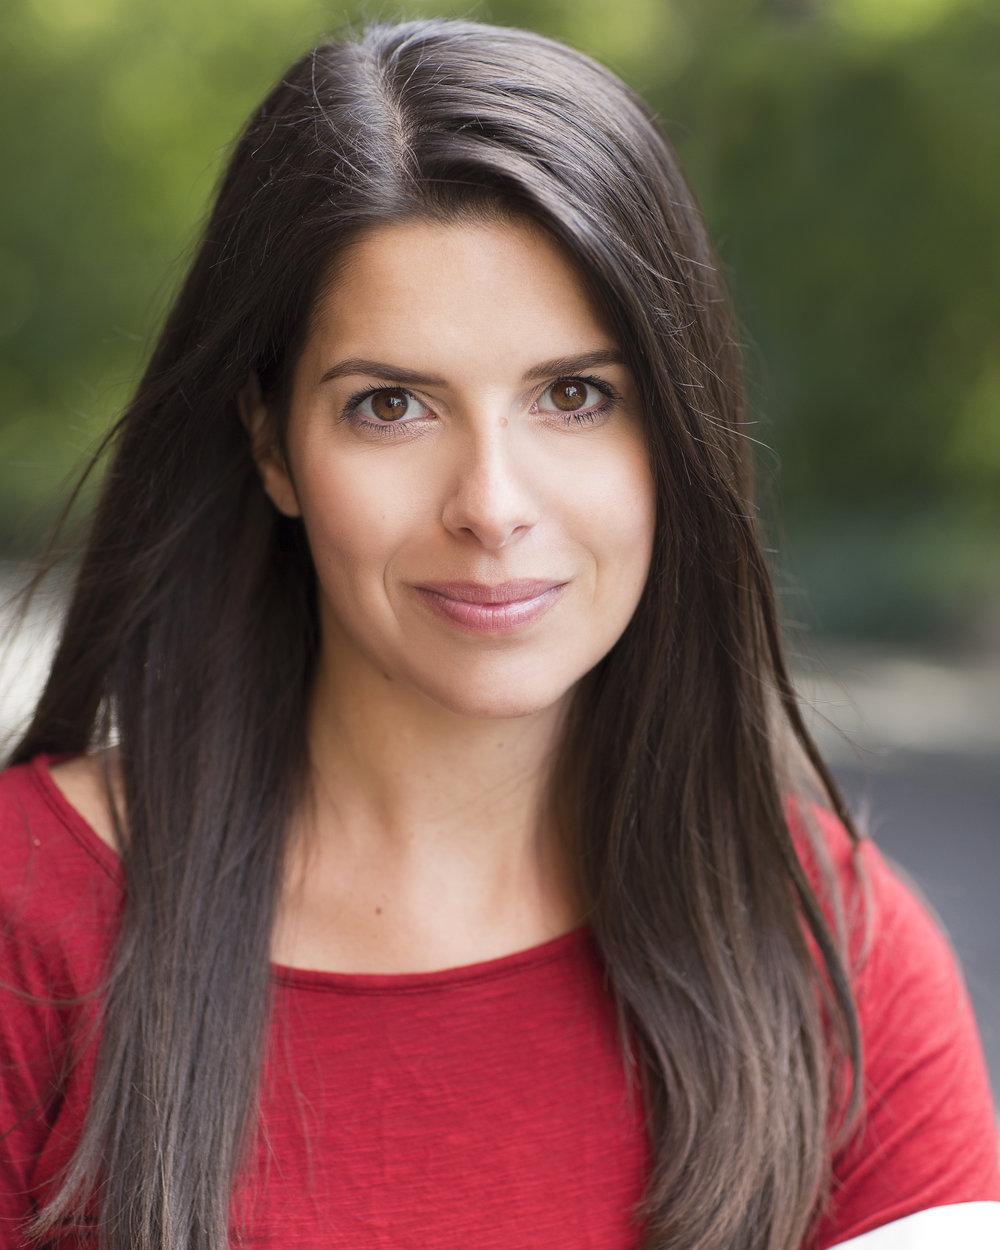 Emma Hilts